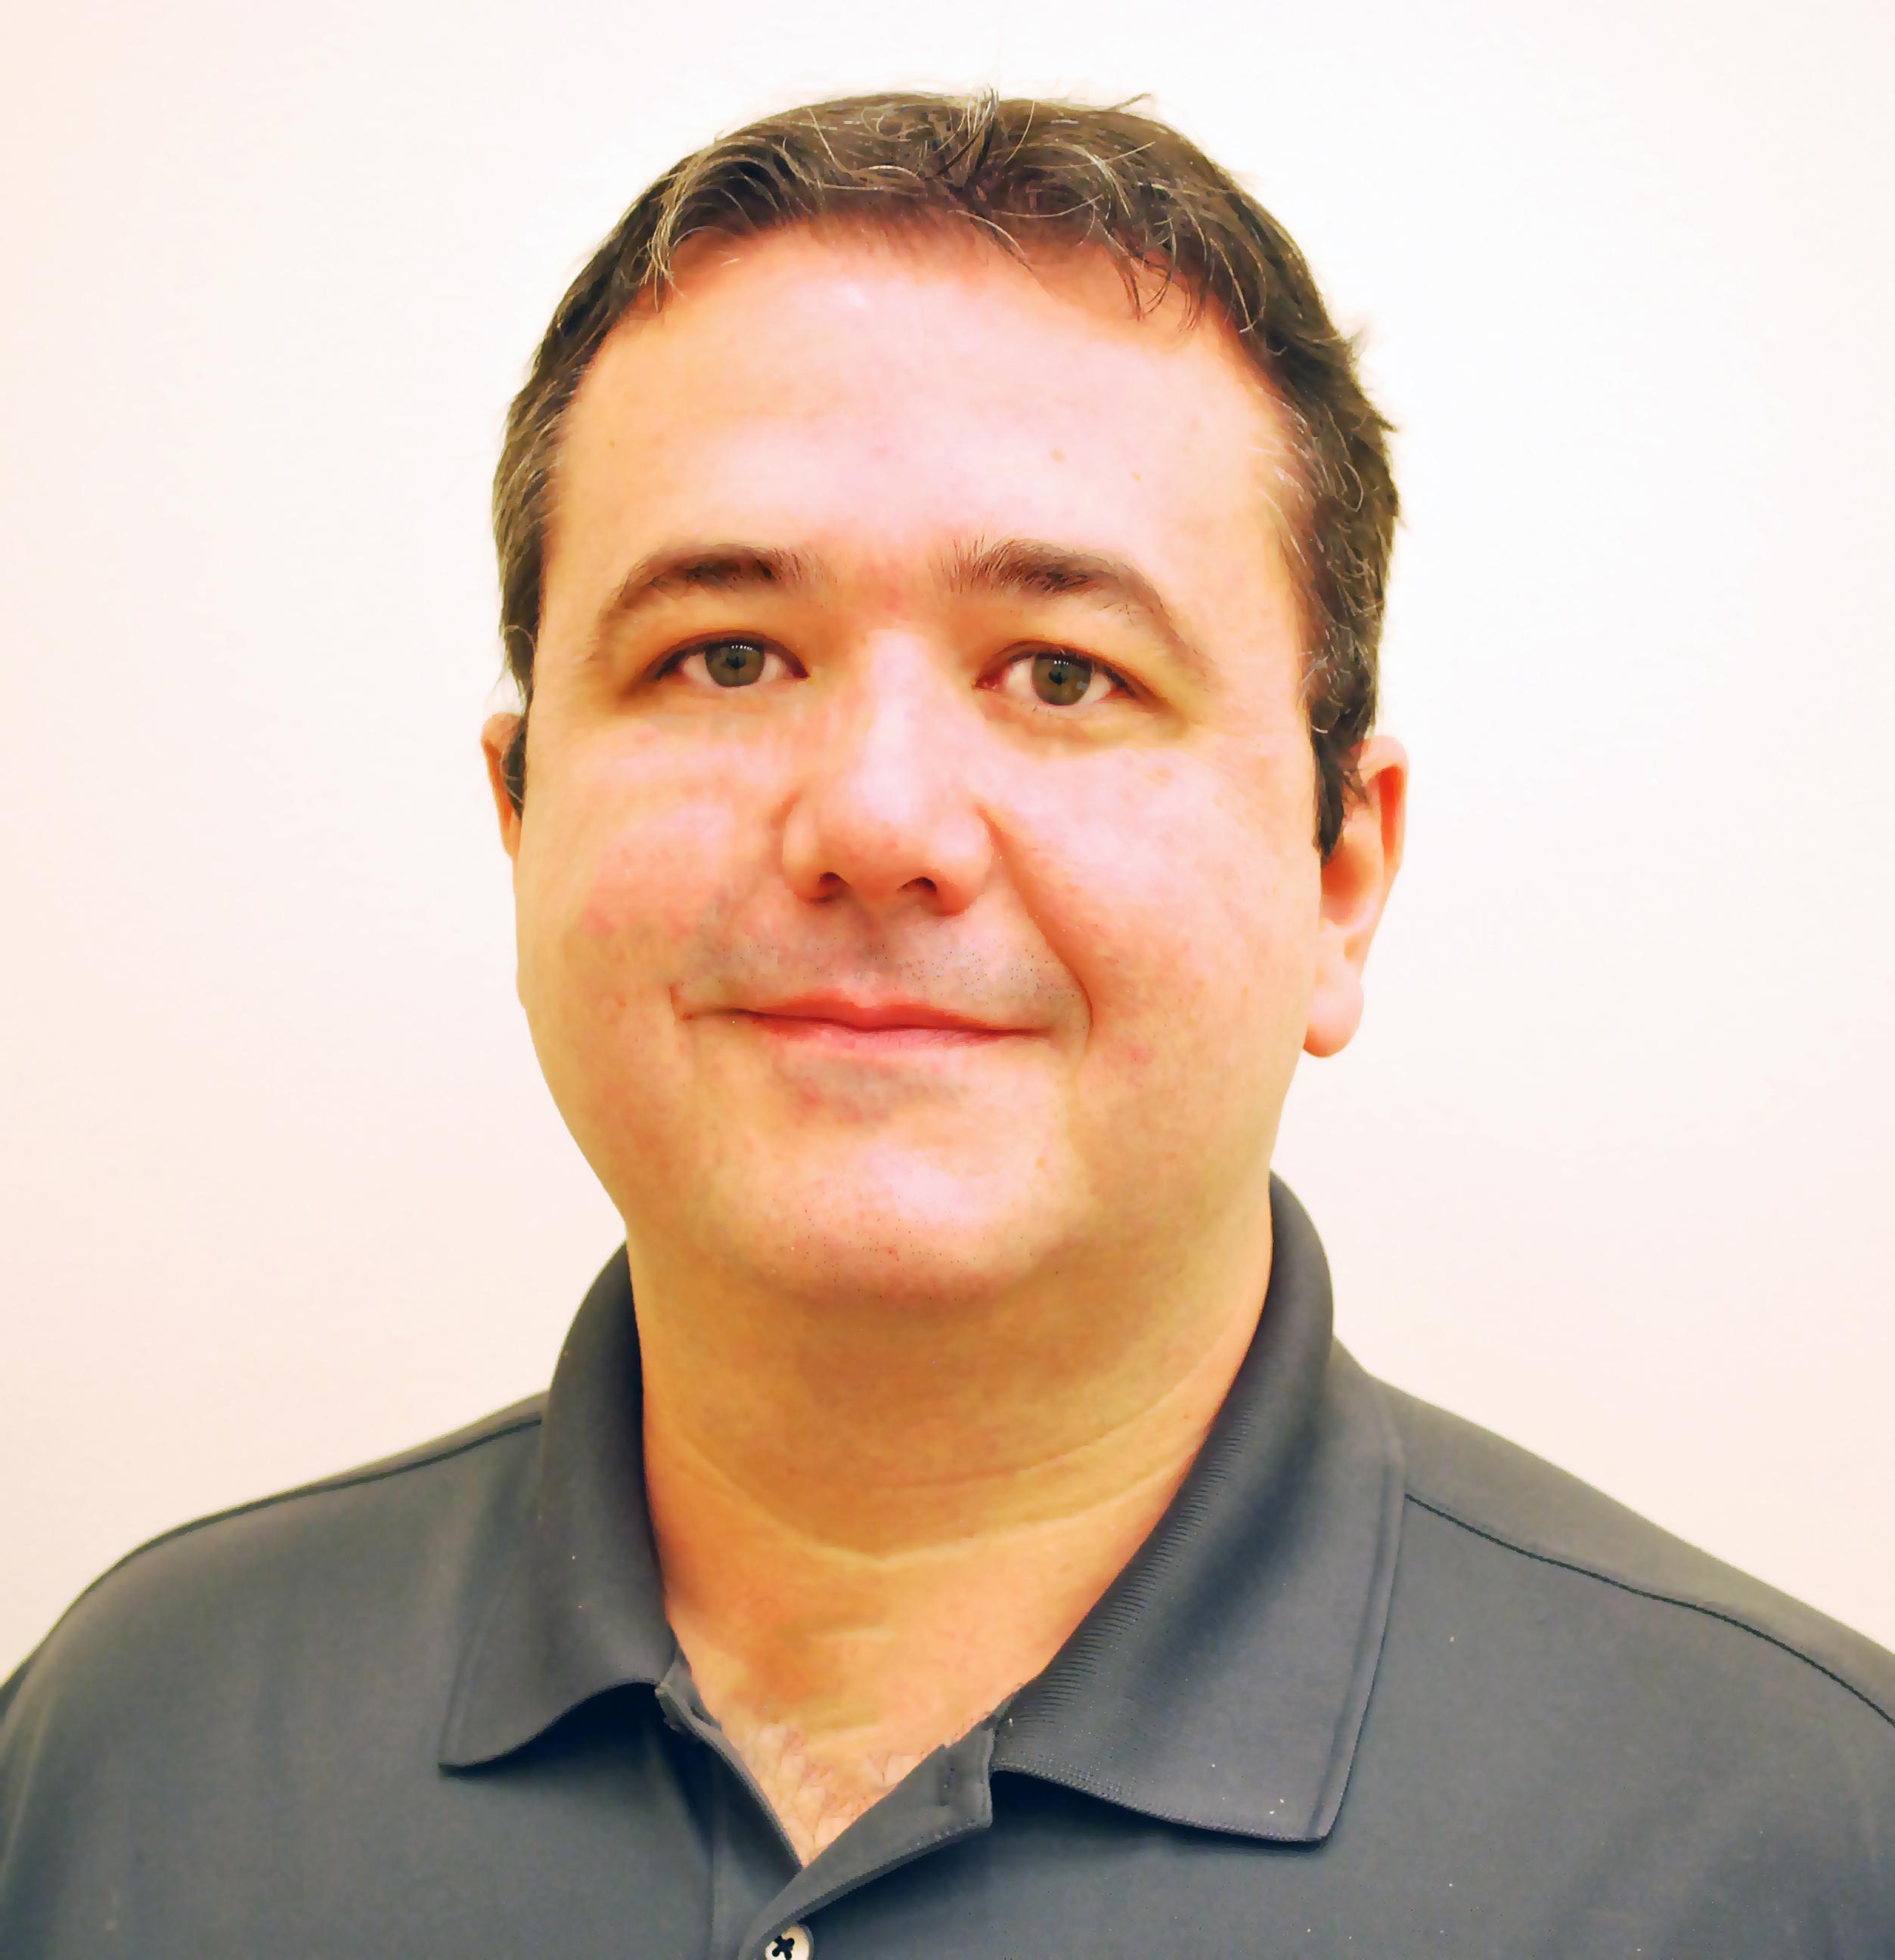 Burak Akyuz, Immediate Past President Team Lead-Metallurgy & Failure  Analysis Applied Technical Services, Inc. Marietta, GA